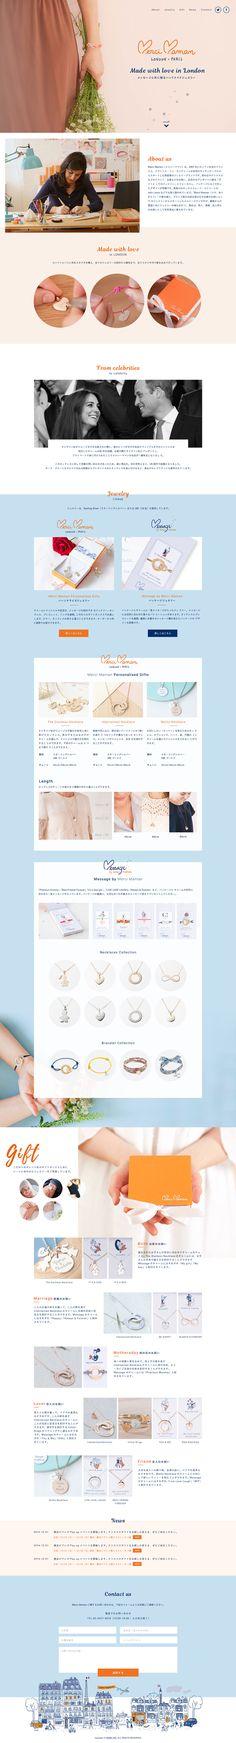 Merici Maman  #Webデザイン #Design#ジュエリー